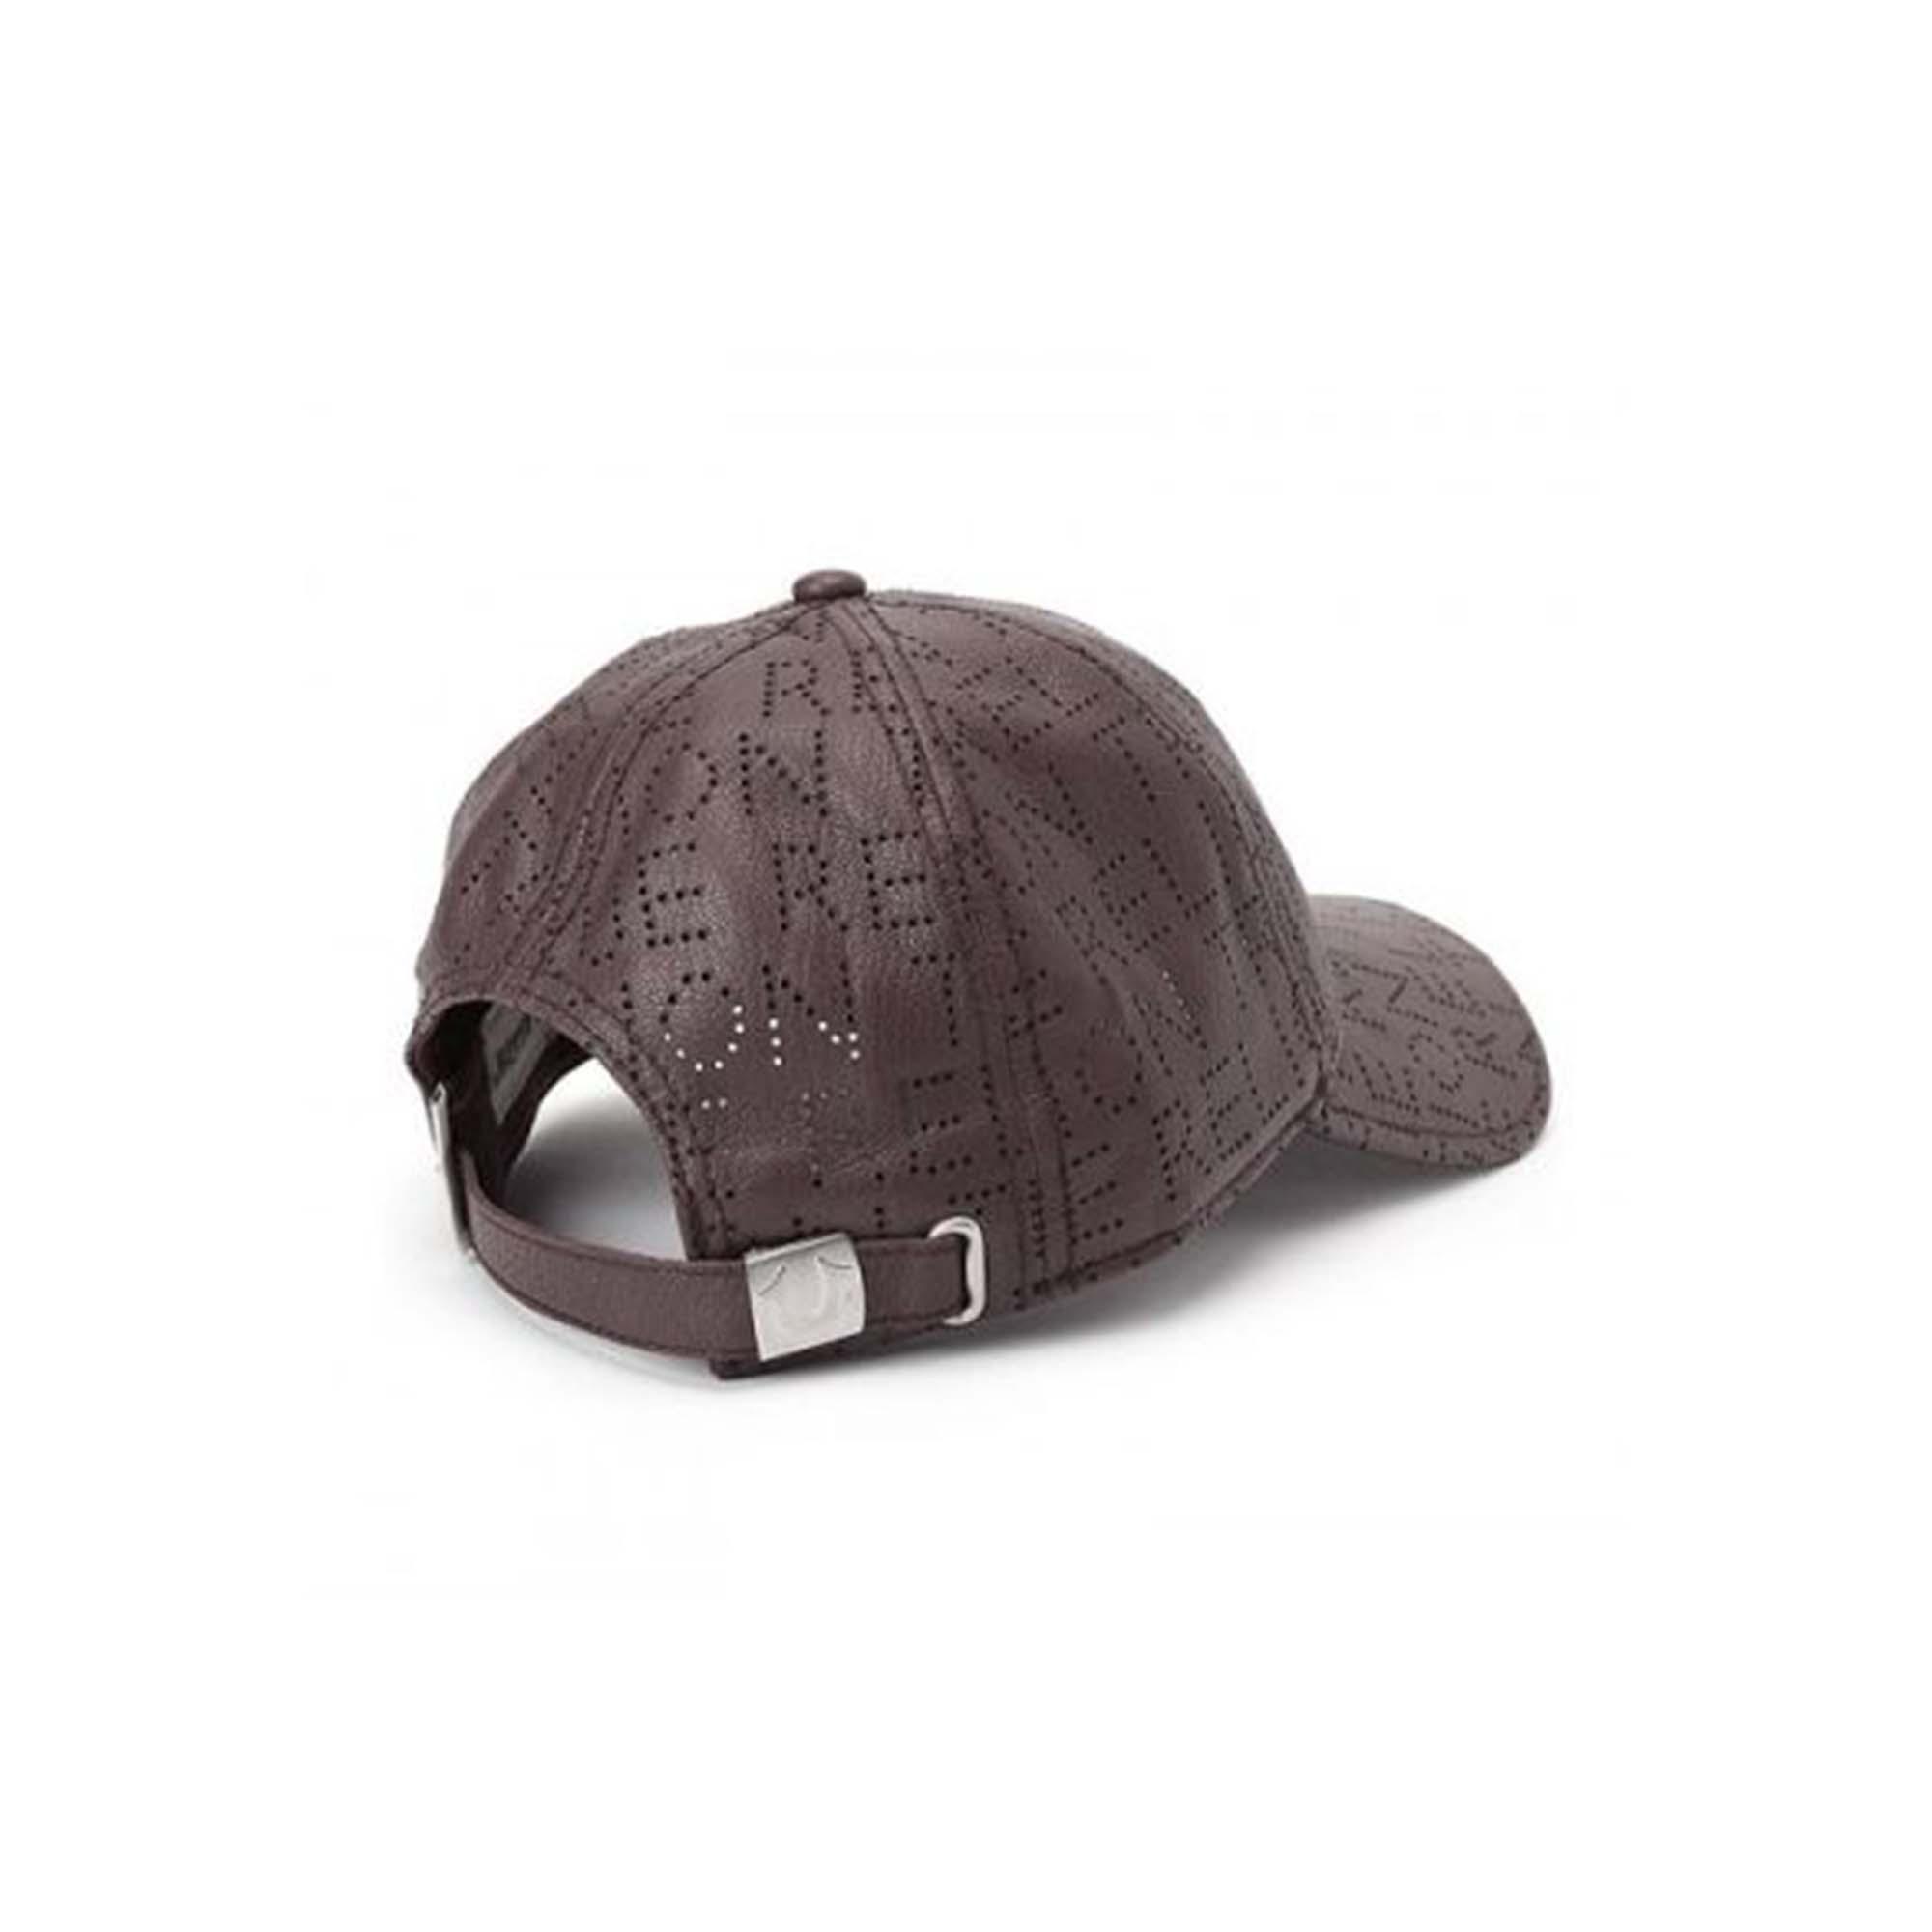 C07/HH - BASEBALL CAP